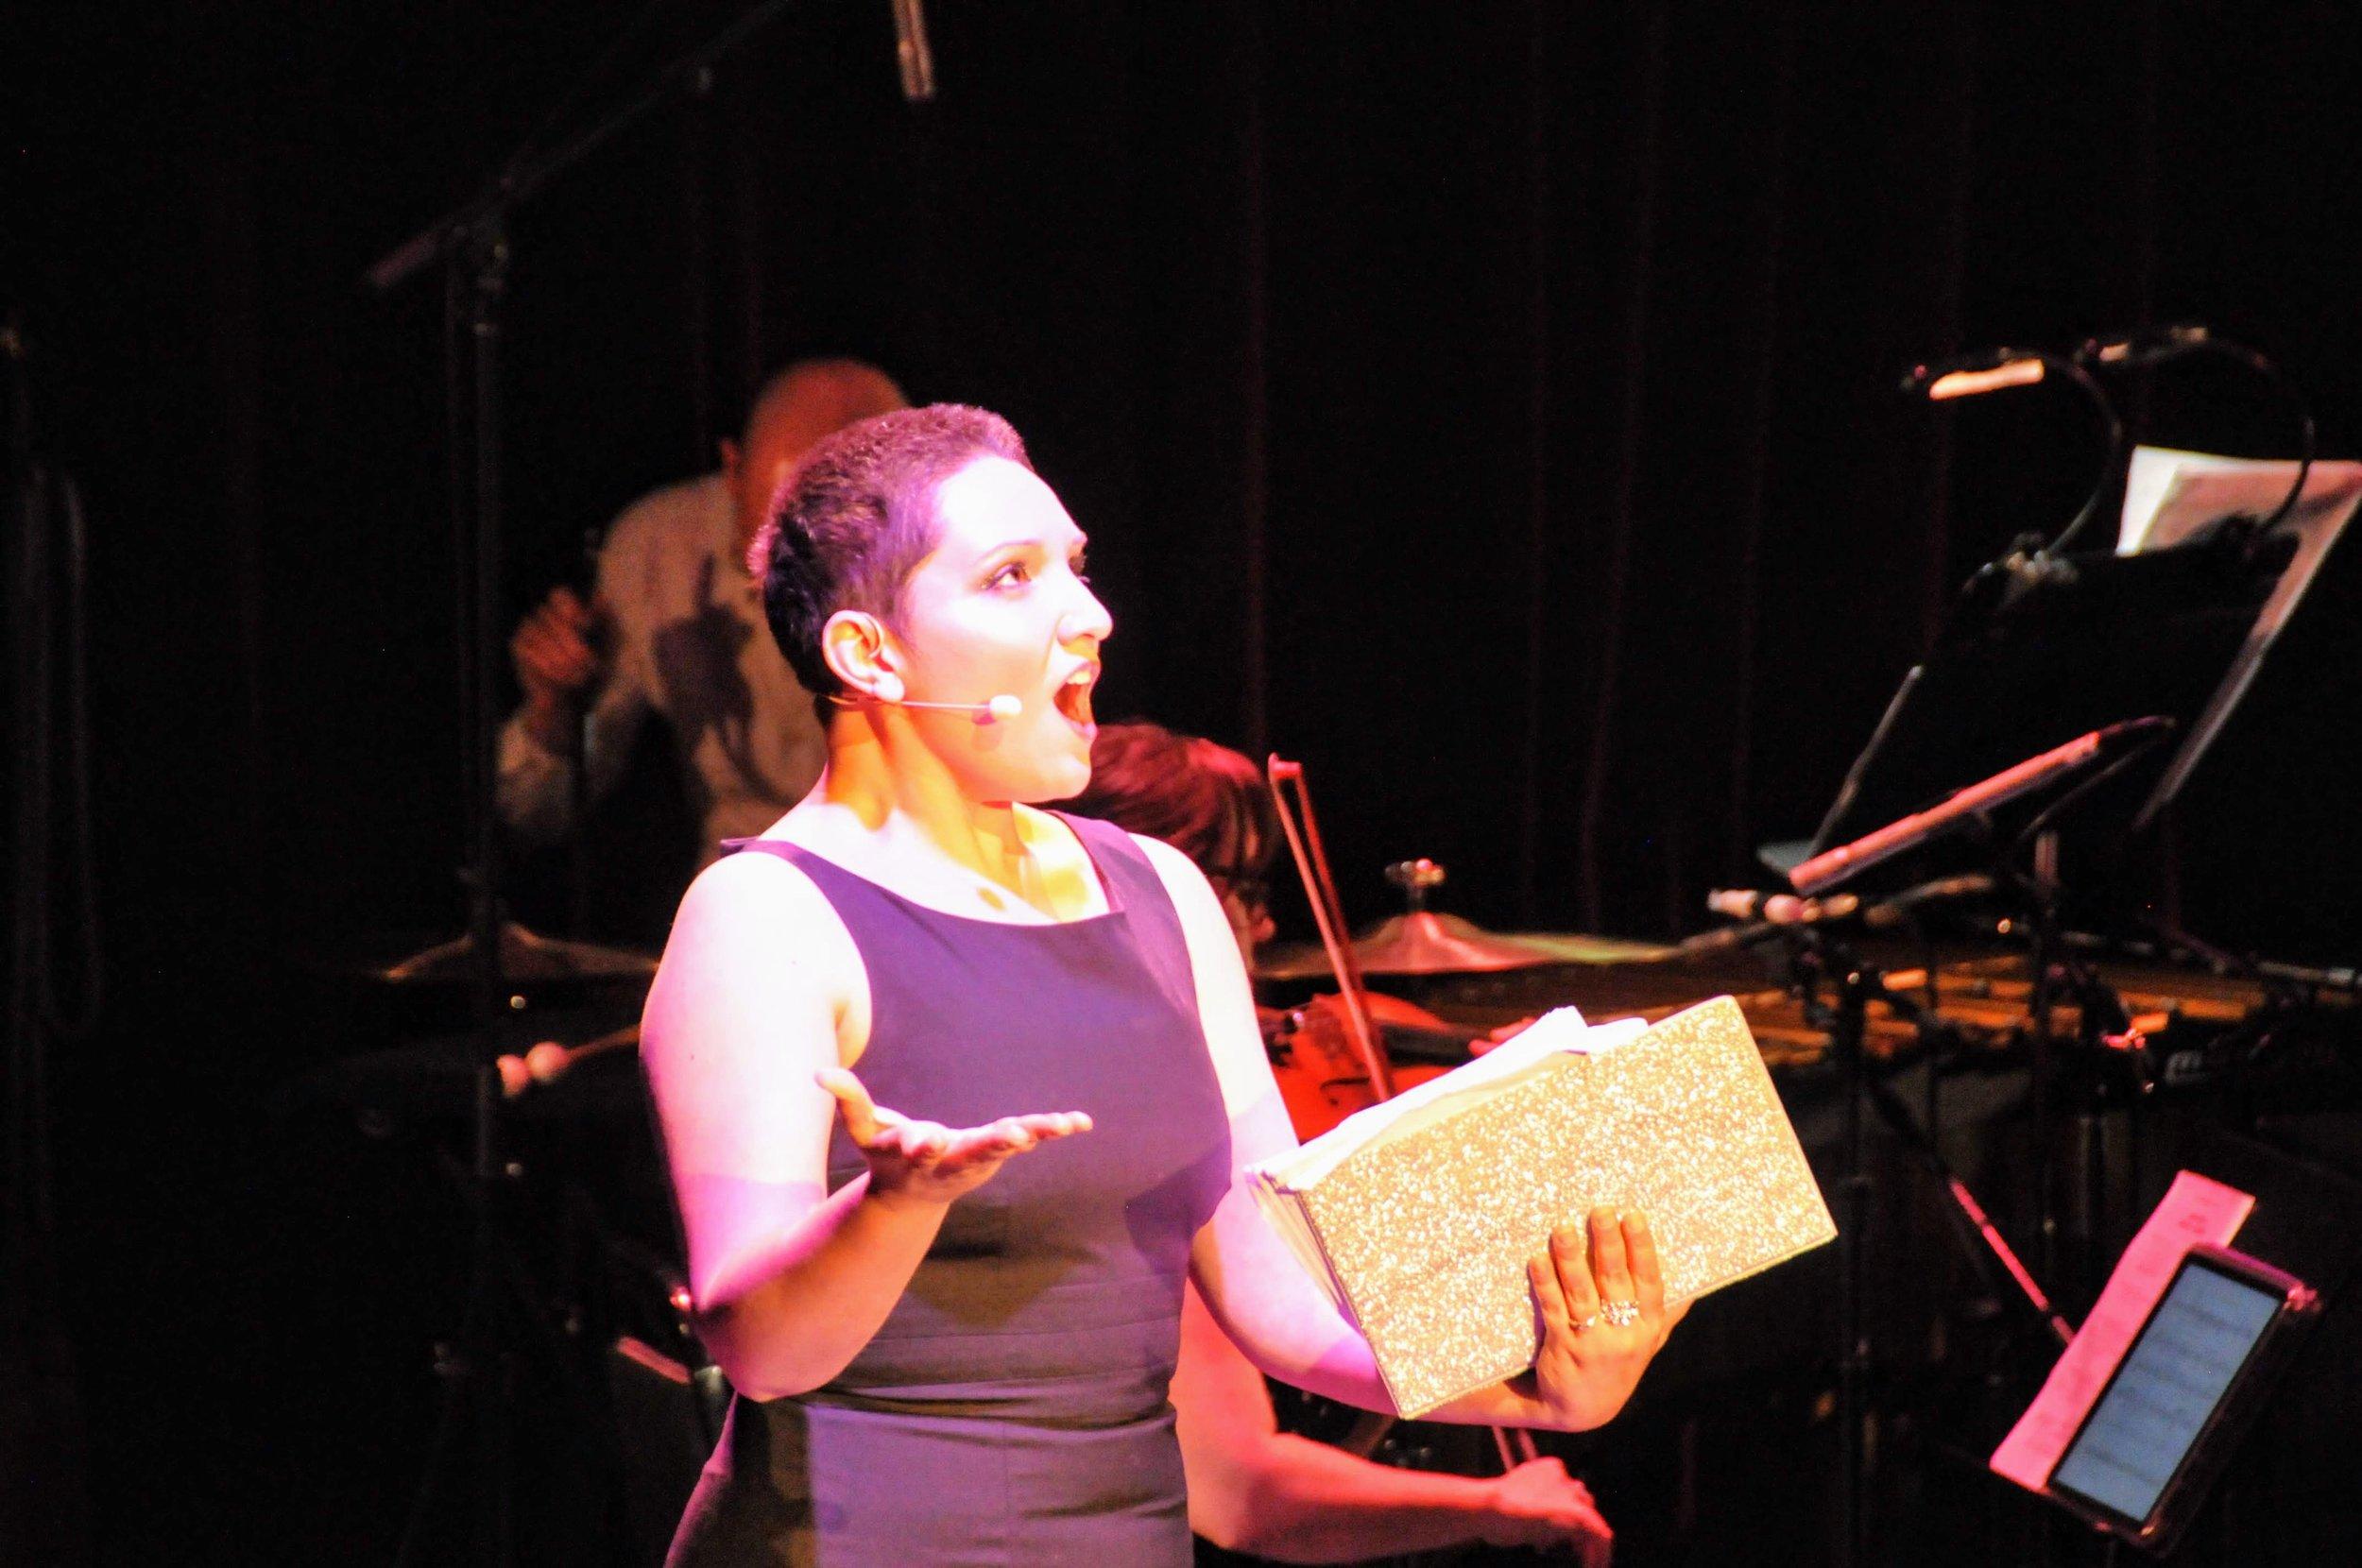 Aliana de la Guardia, singing with a vibrant voice… sang resplendently - Boston Classical Review